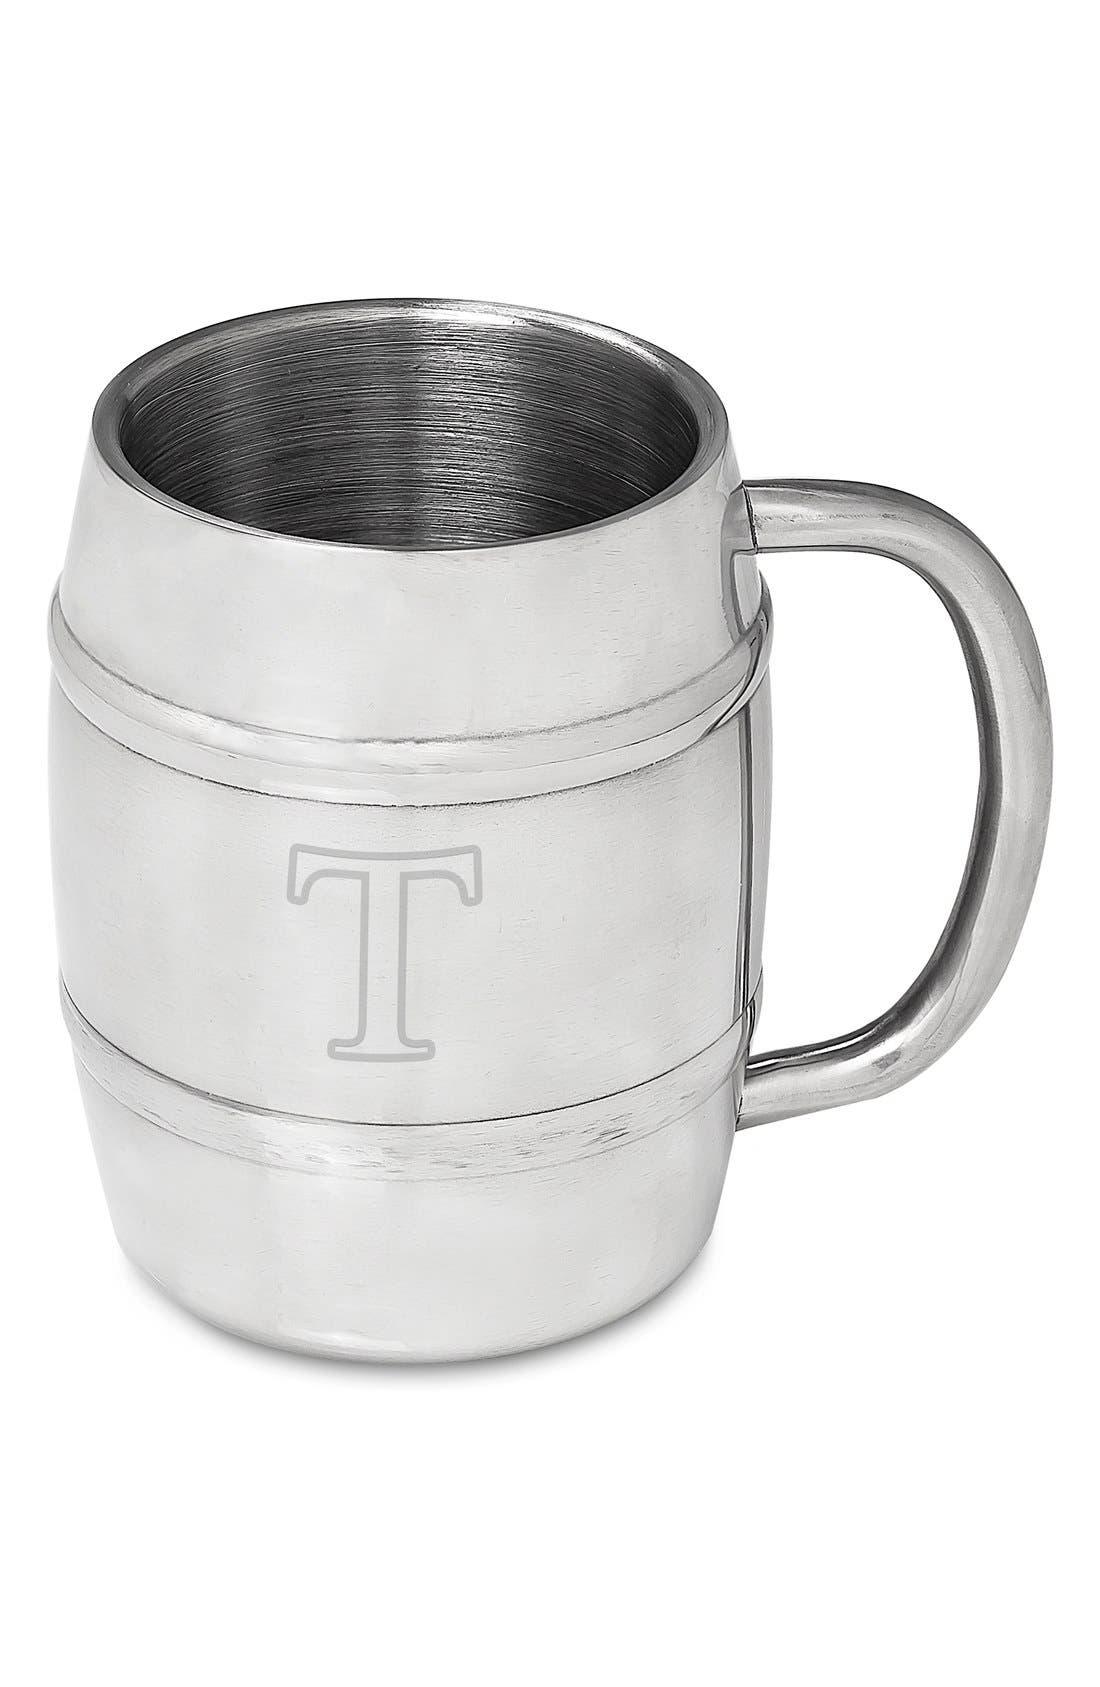 Monogram Stainless Steel Keg Mug,                             Main thumbnail 1, color,                             040